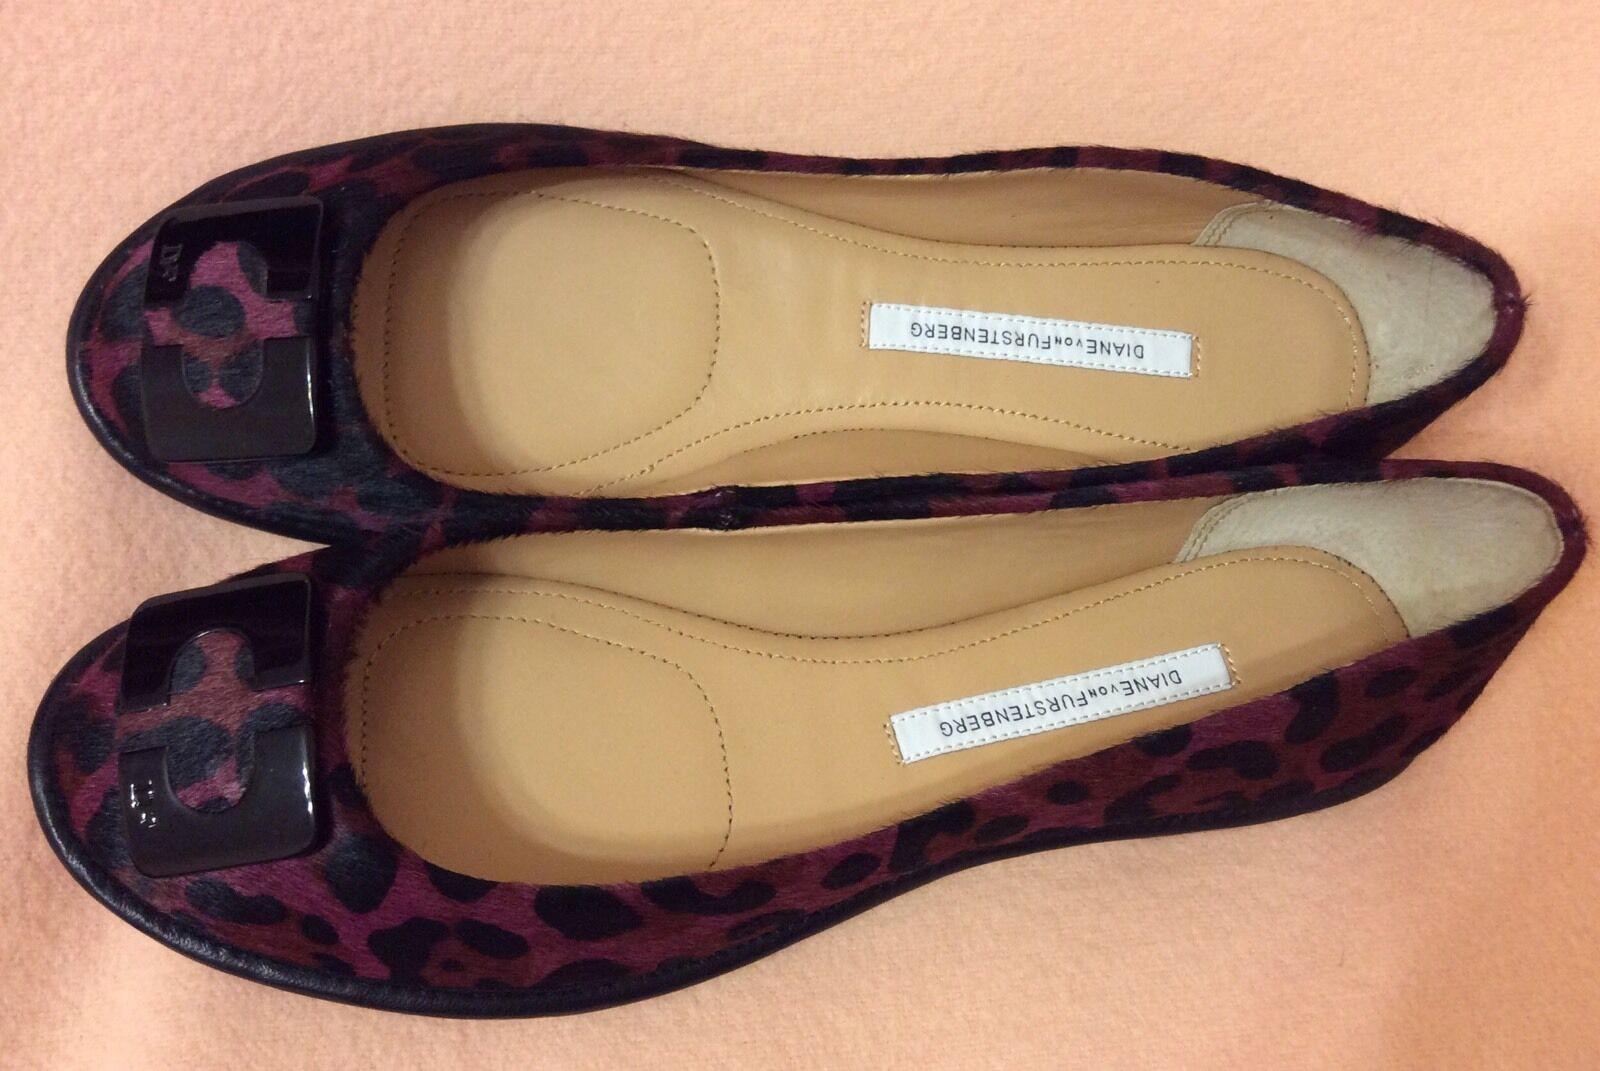 Gabor da Donna Fashion Zeppa Tacchi Alti Sandali, Blu UK Nero (Schwarz 67) 4.5 UK Blu 798340